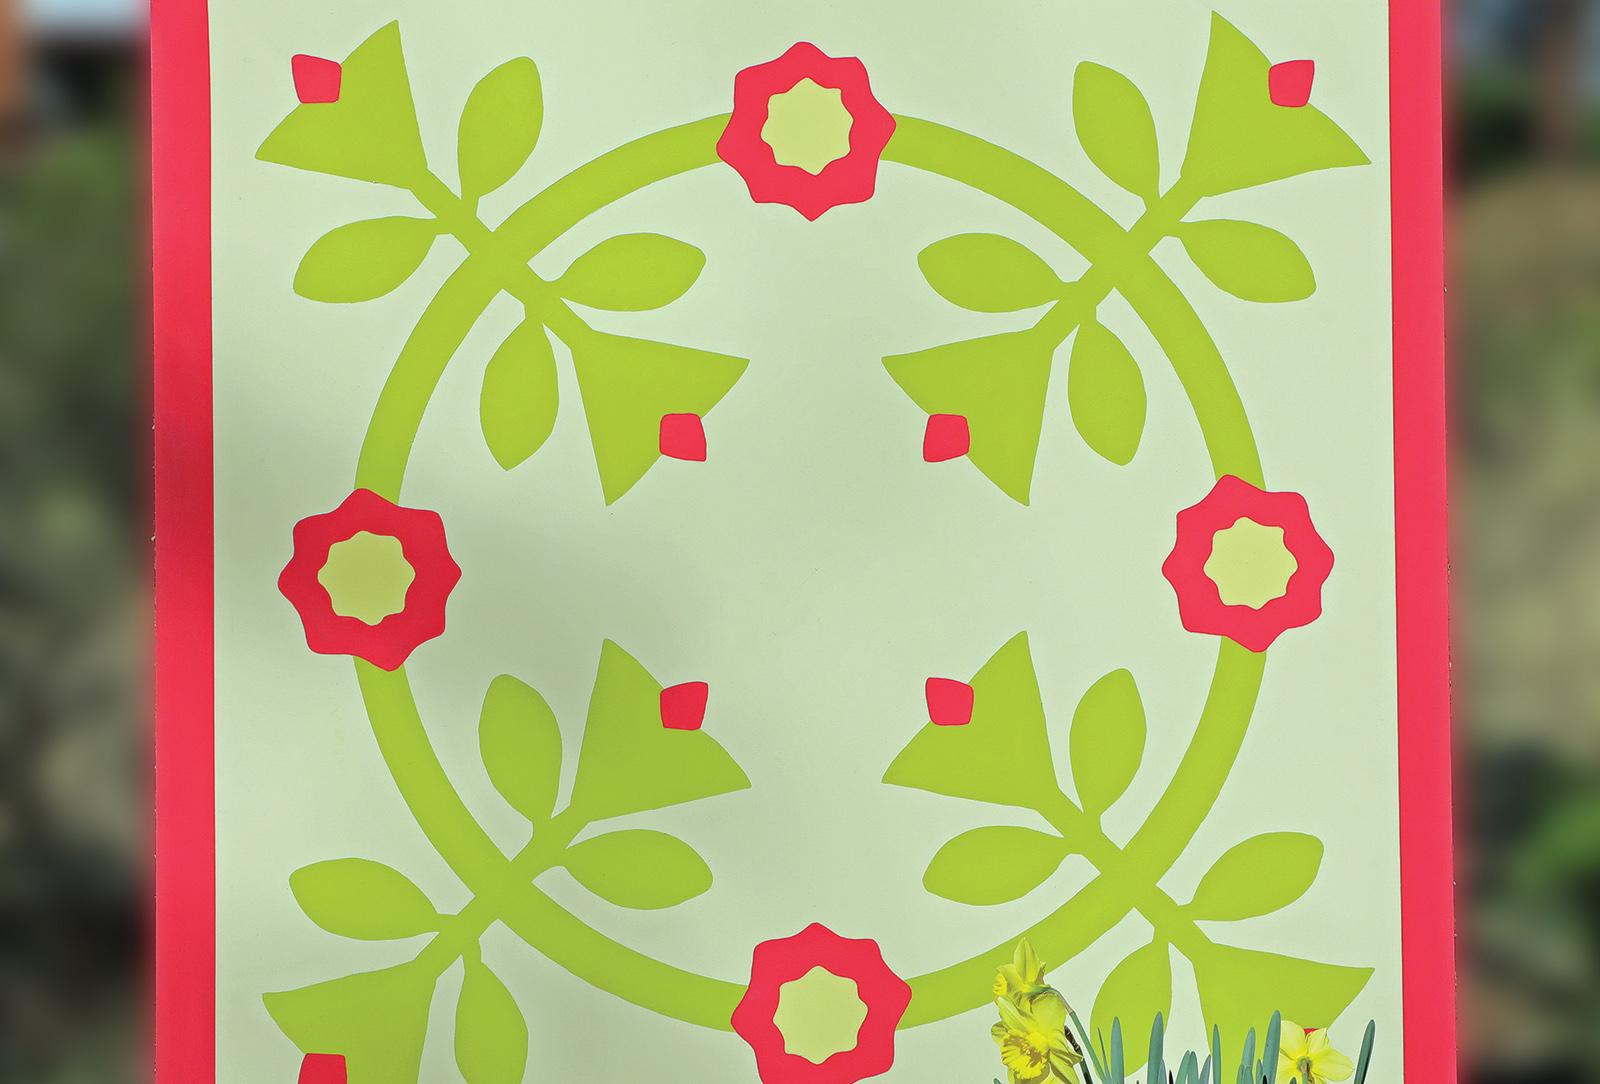 highlands nc Wreath of Roses Quilt Block